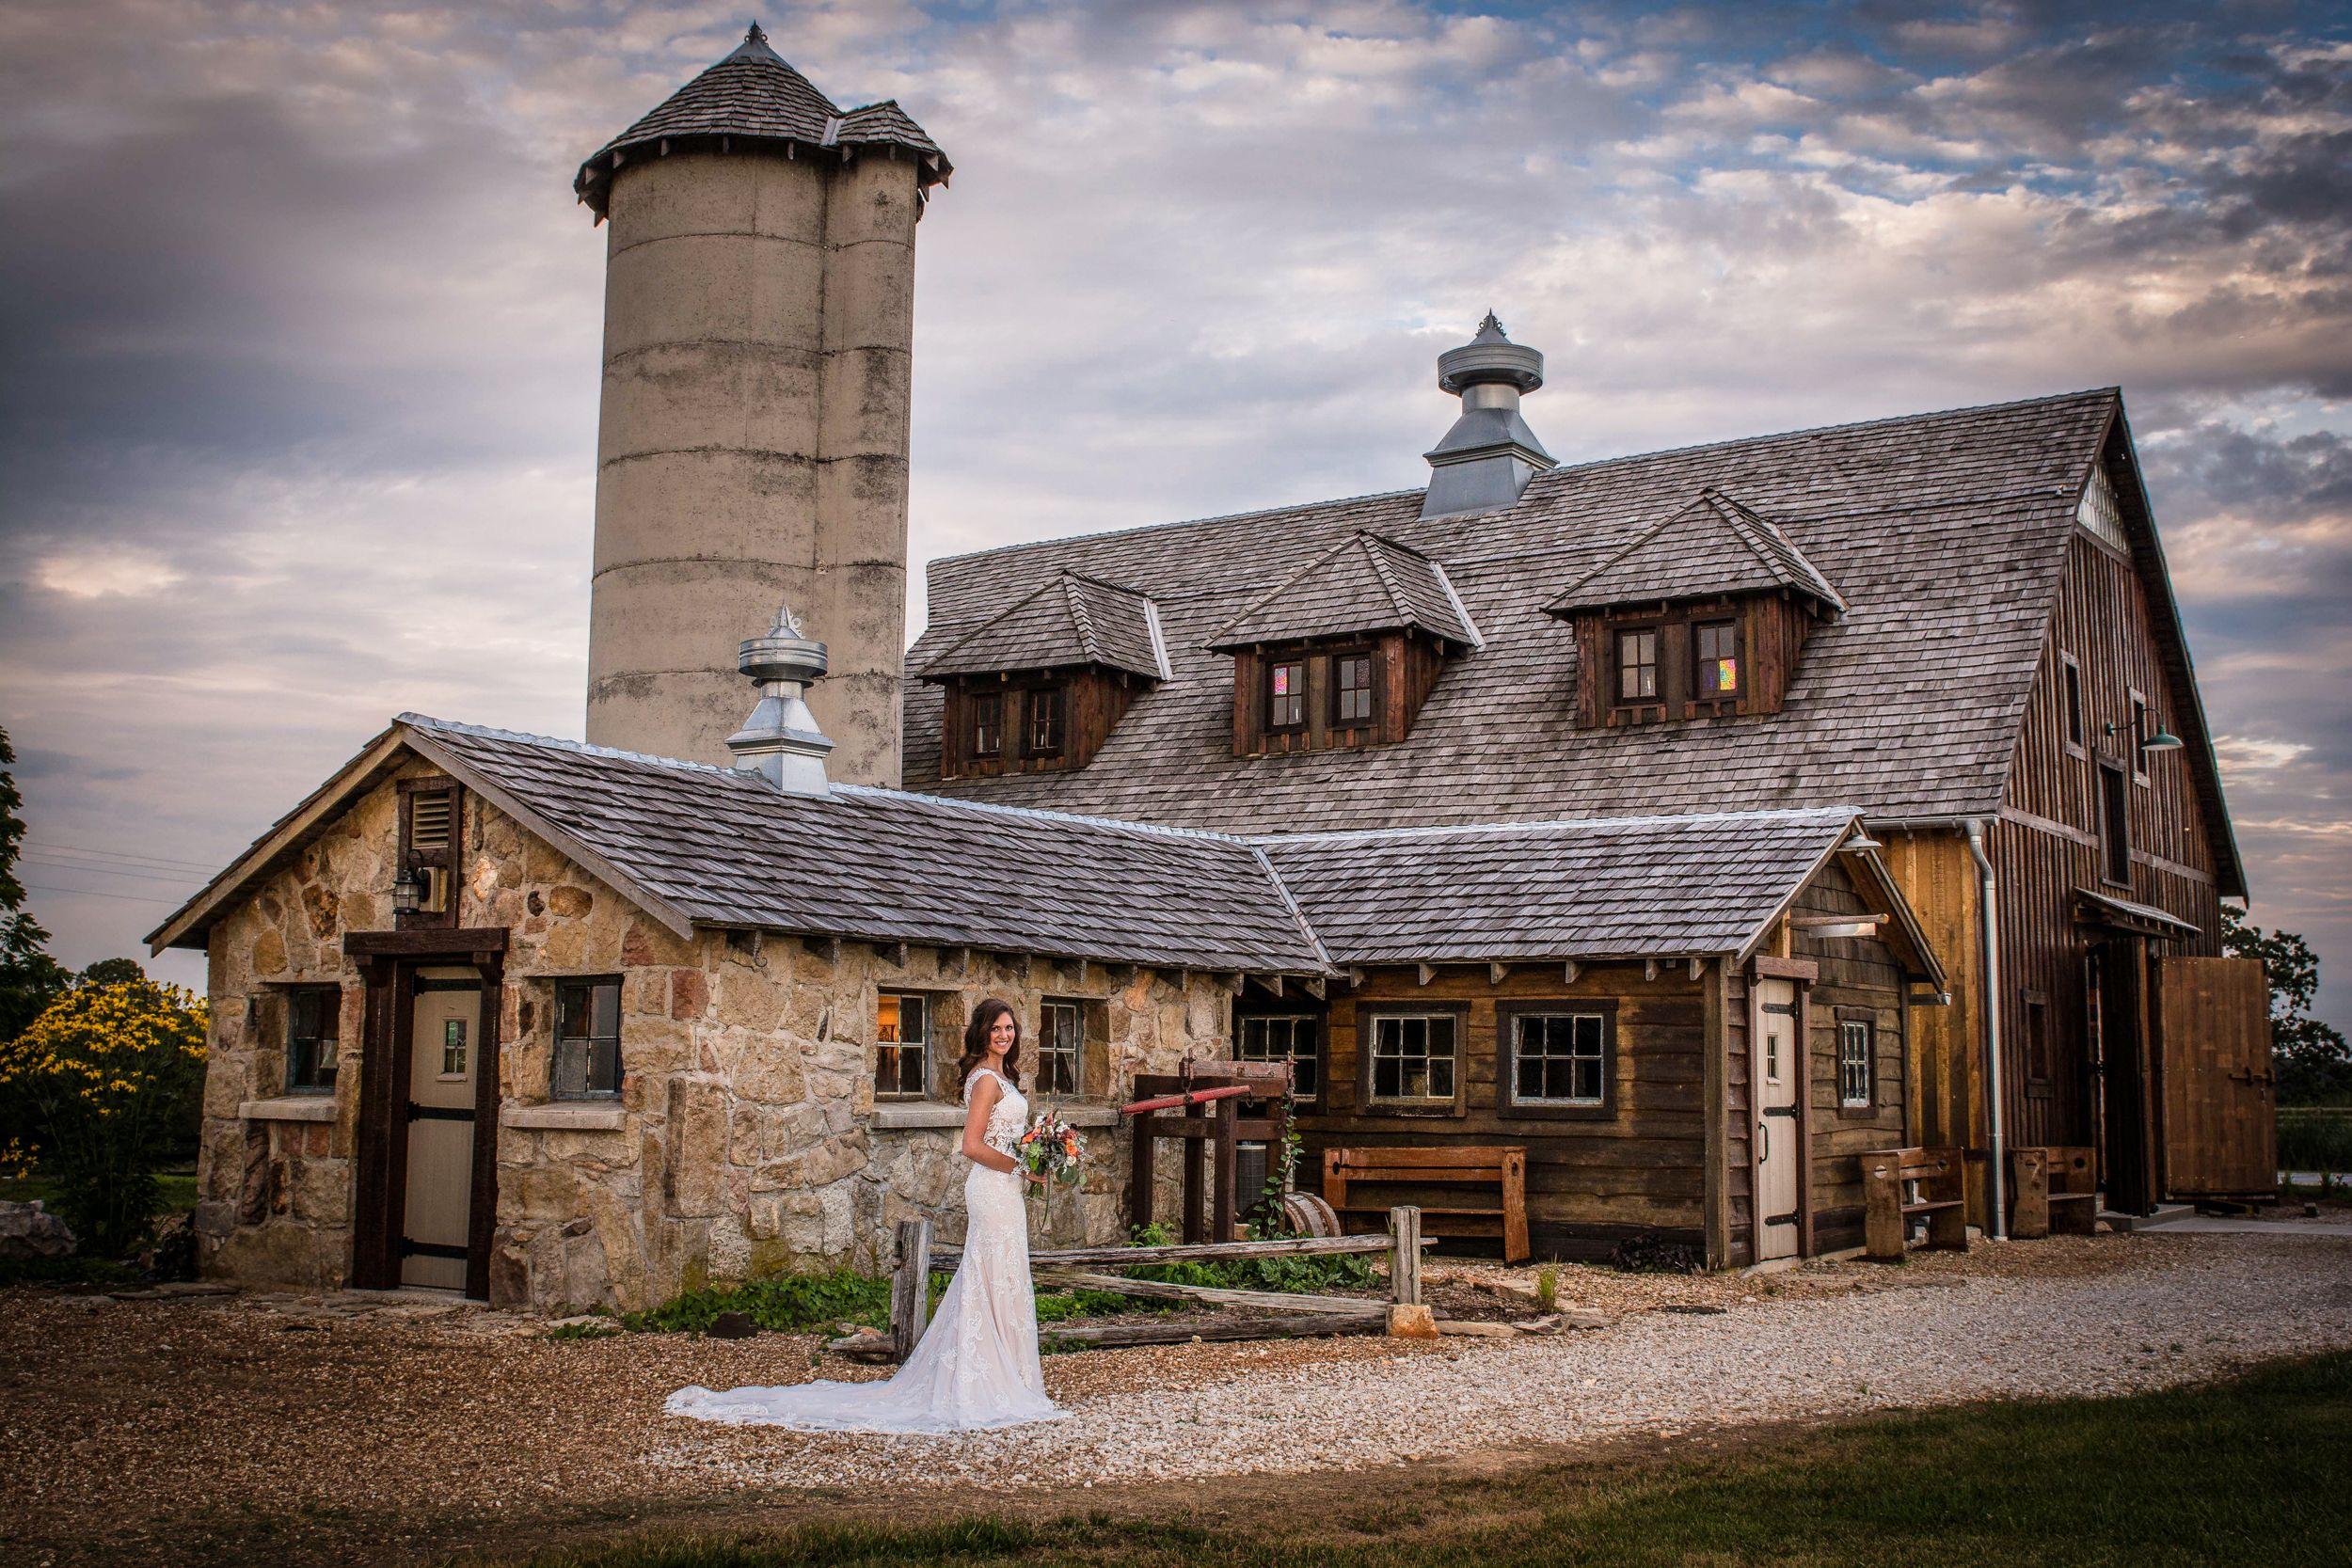 Photographs – Storybook Barn – Weddings, retreats and events